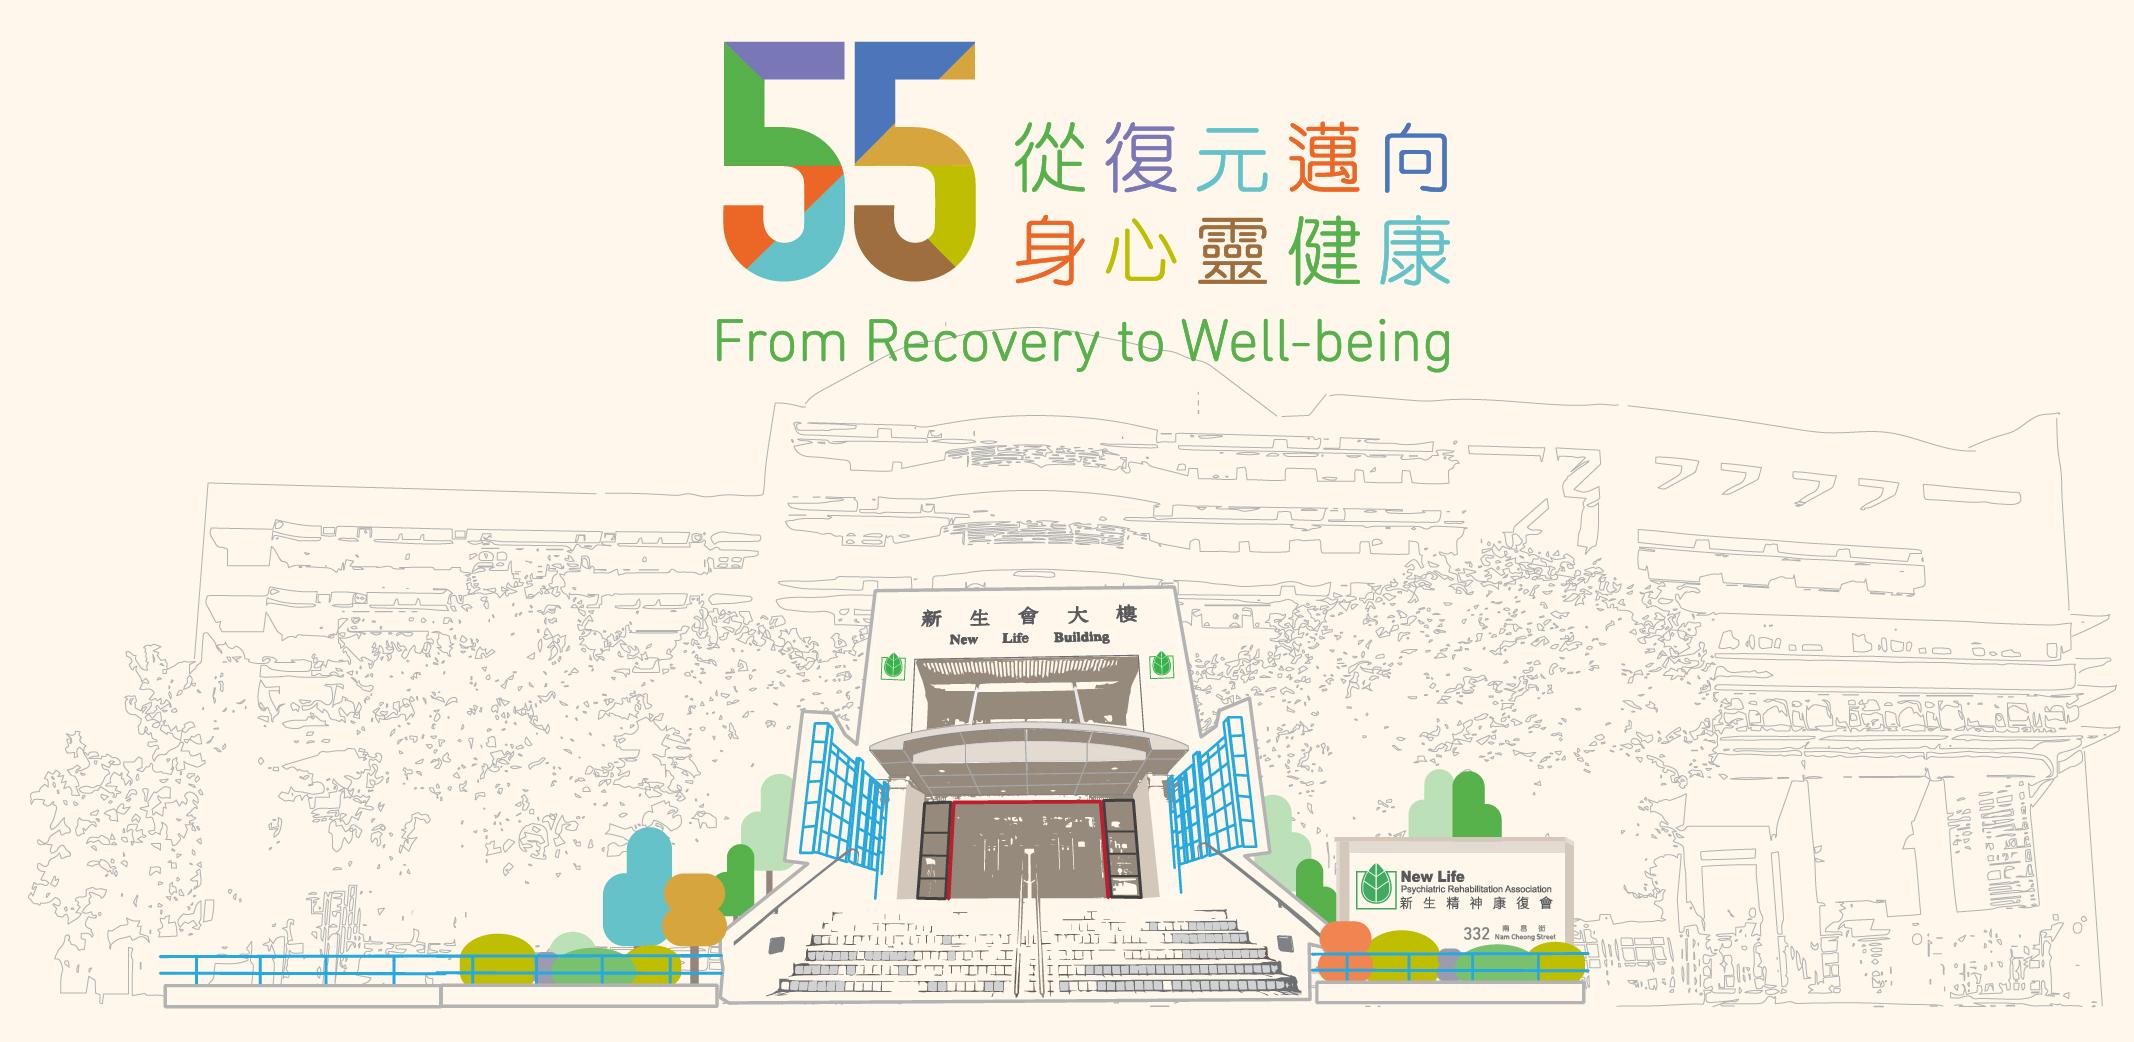 55th Anniversary